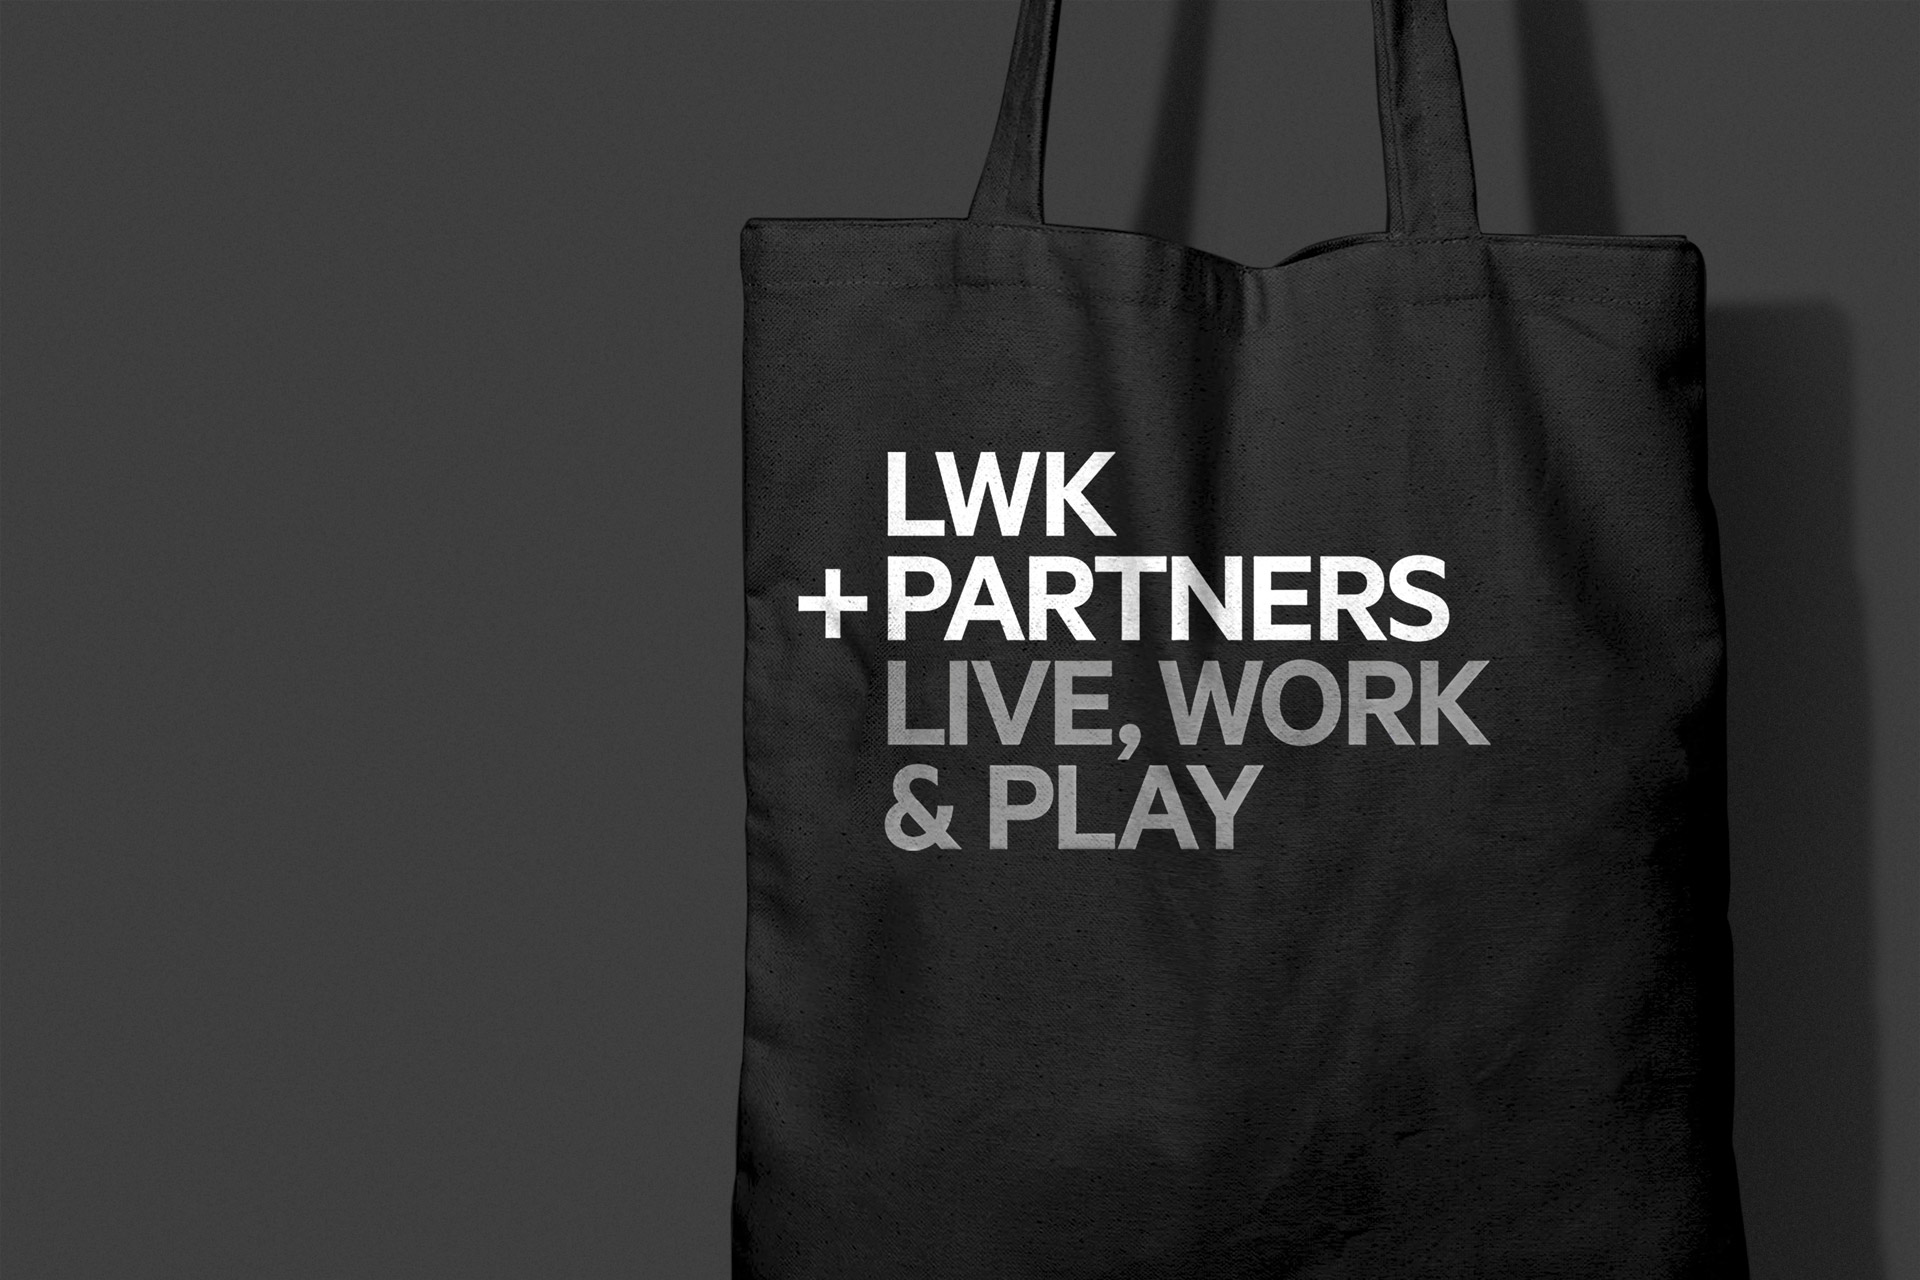 lwk-partners_21